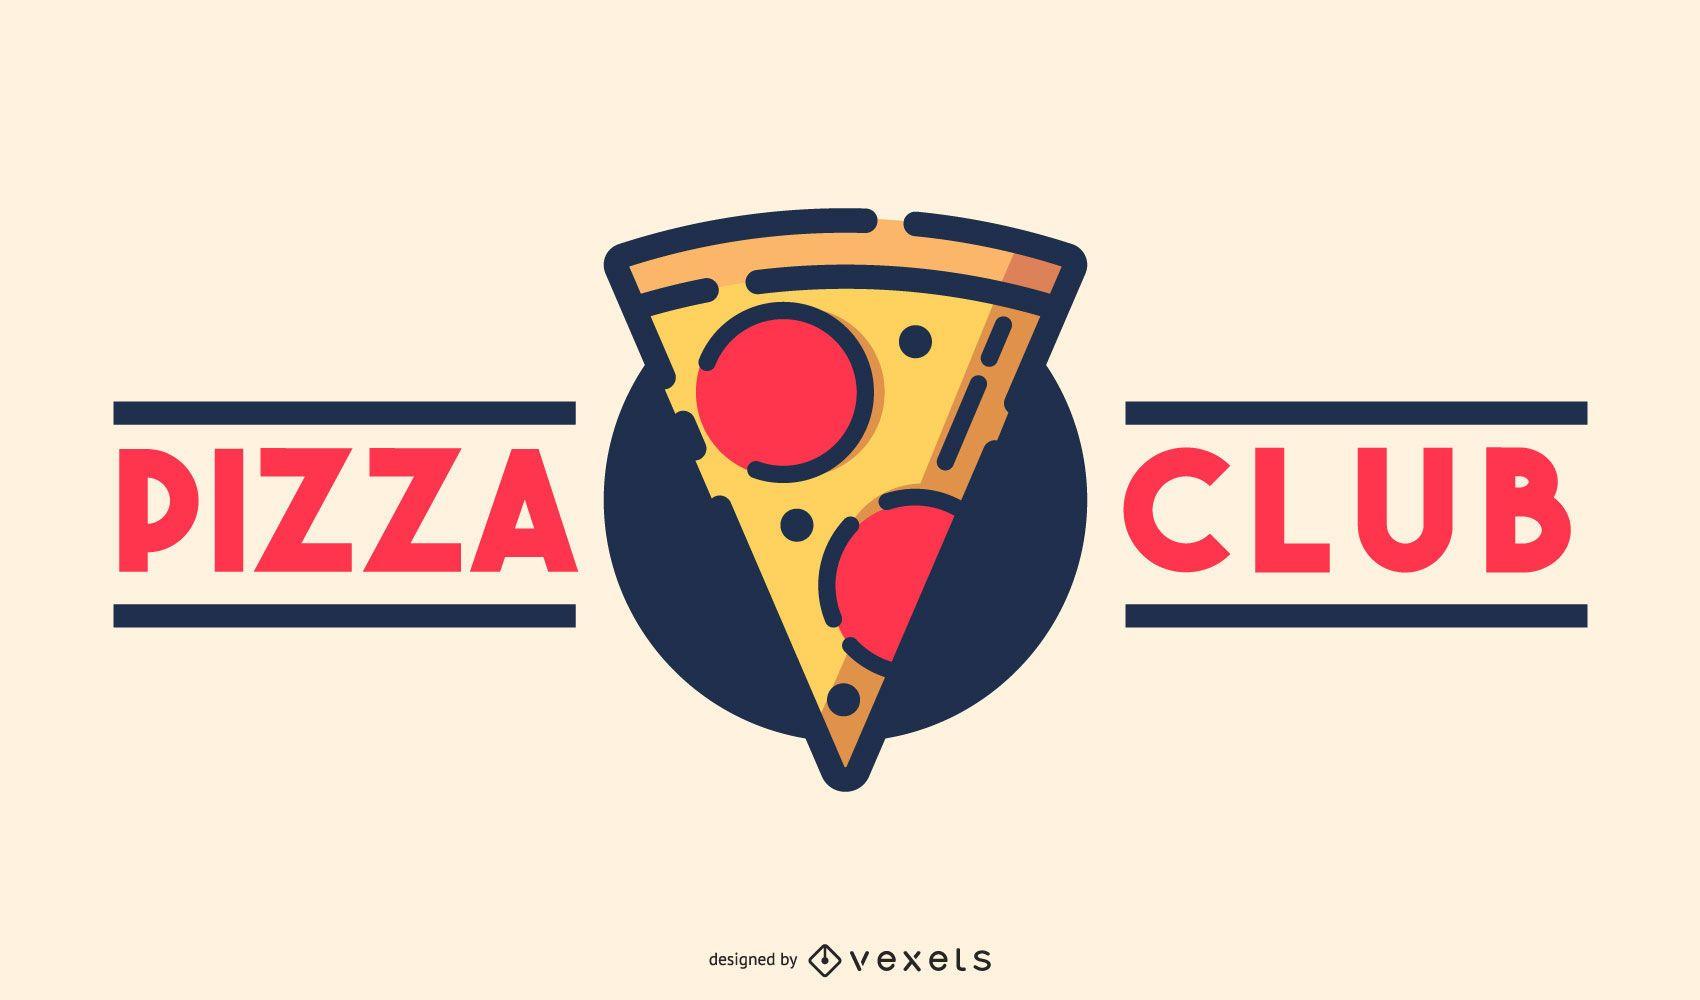 Diseño de logo de pizza club